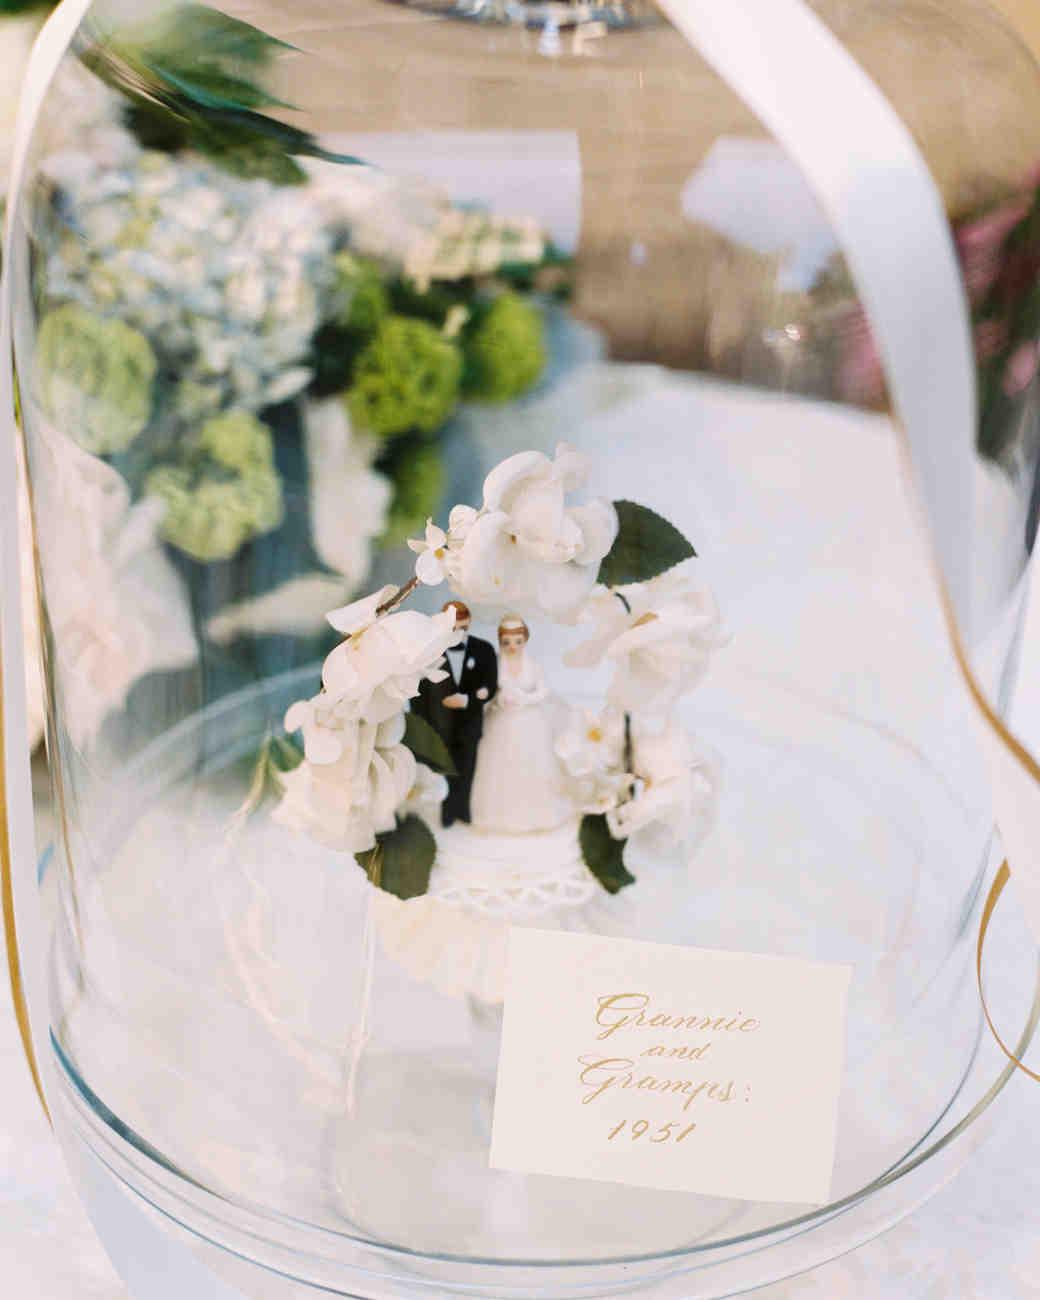 taylor-john-wedding-toppers-454-s112507-0116.jpg